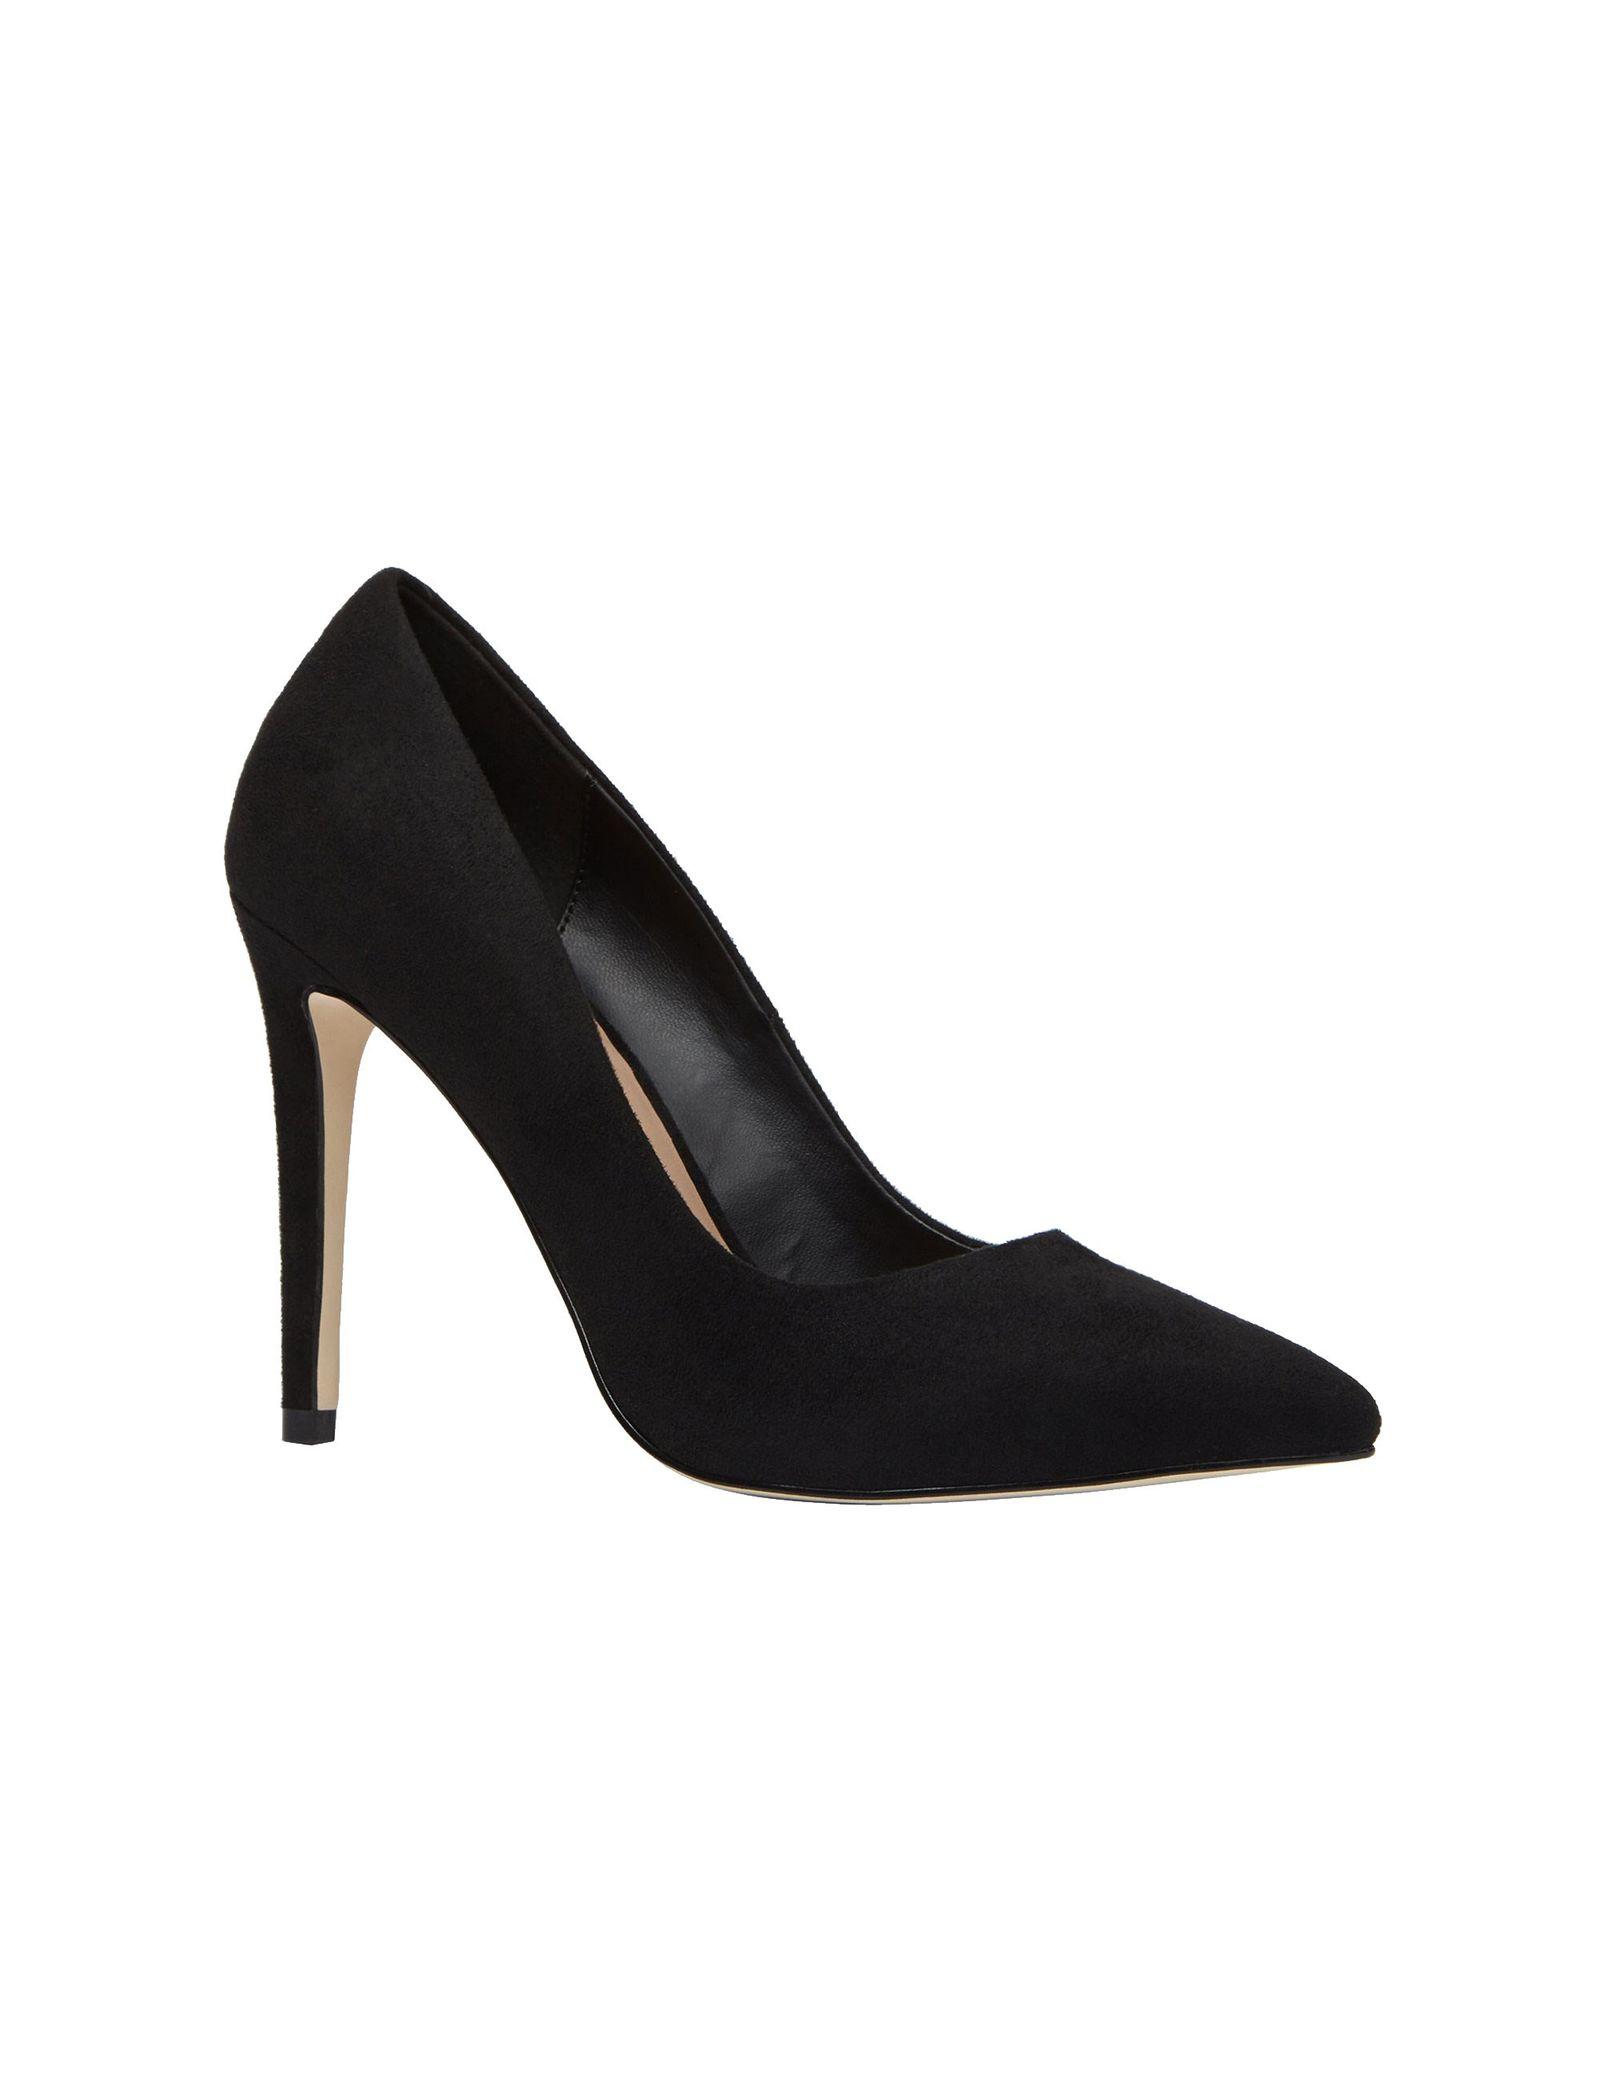 کفش پاشنه بلند زنانه - کال ایت اسپرینگ -  - 1